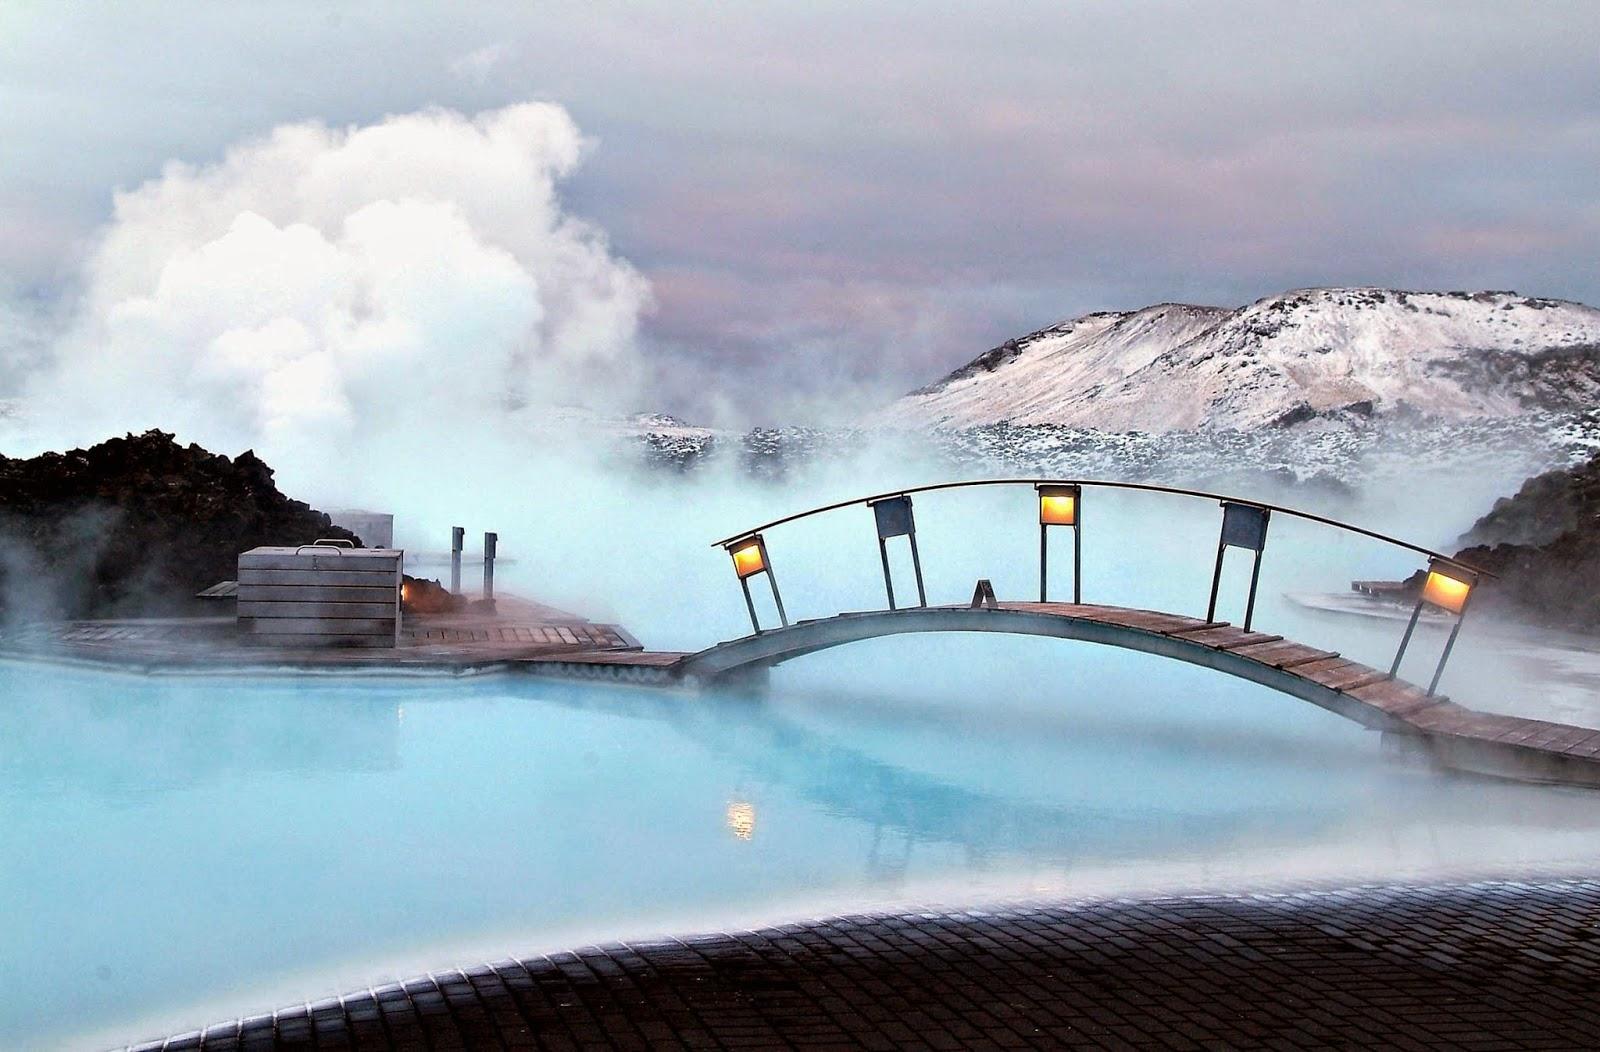 Las piscinas más impresionantes del planeta 9.%2BBlue%2BLagoon%2BGeothermal%2BResort%2B-%2BGrindav%C3%ADk,%2BIceland